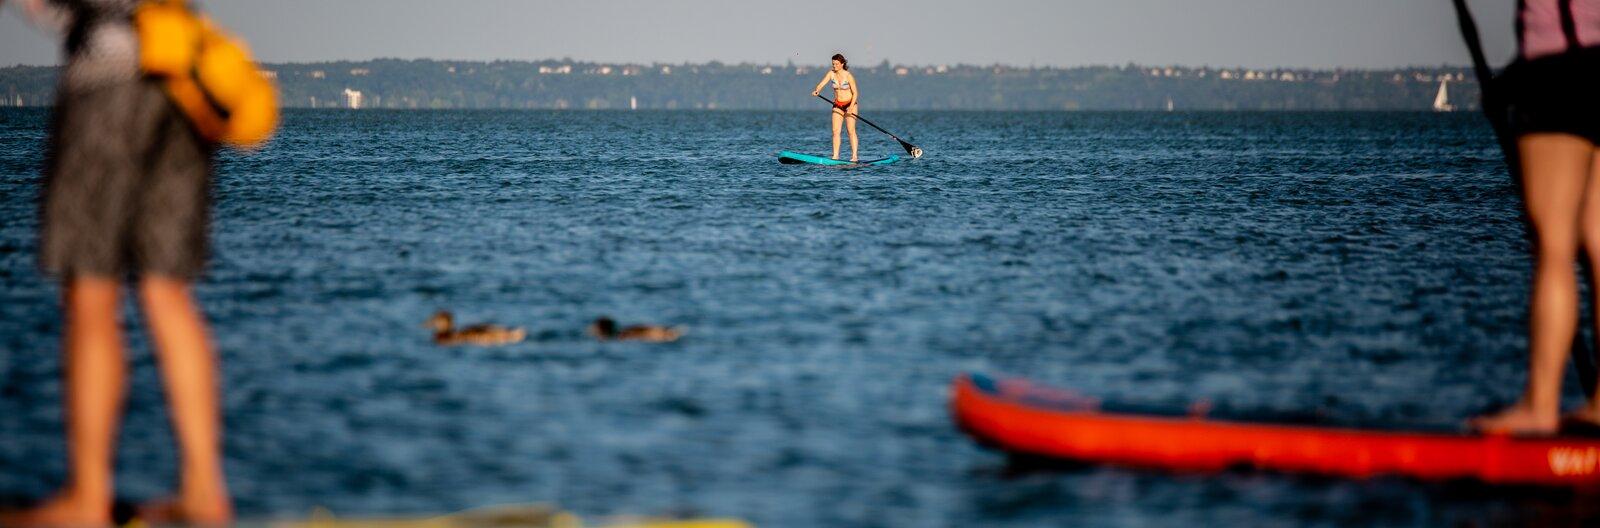 6 best active things to do at Lake Balaton this summer